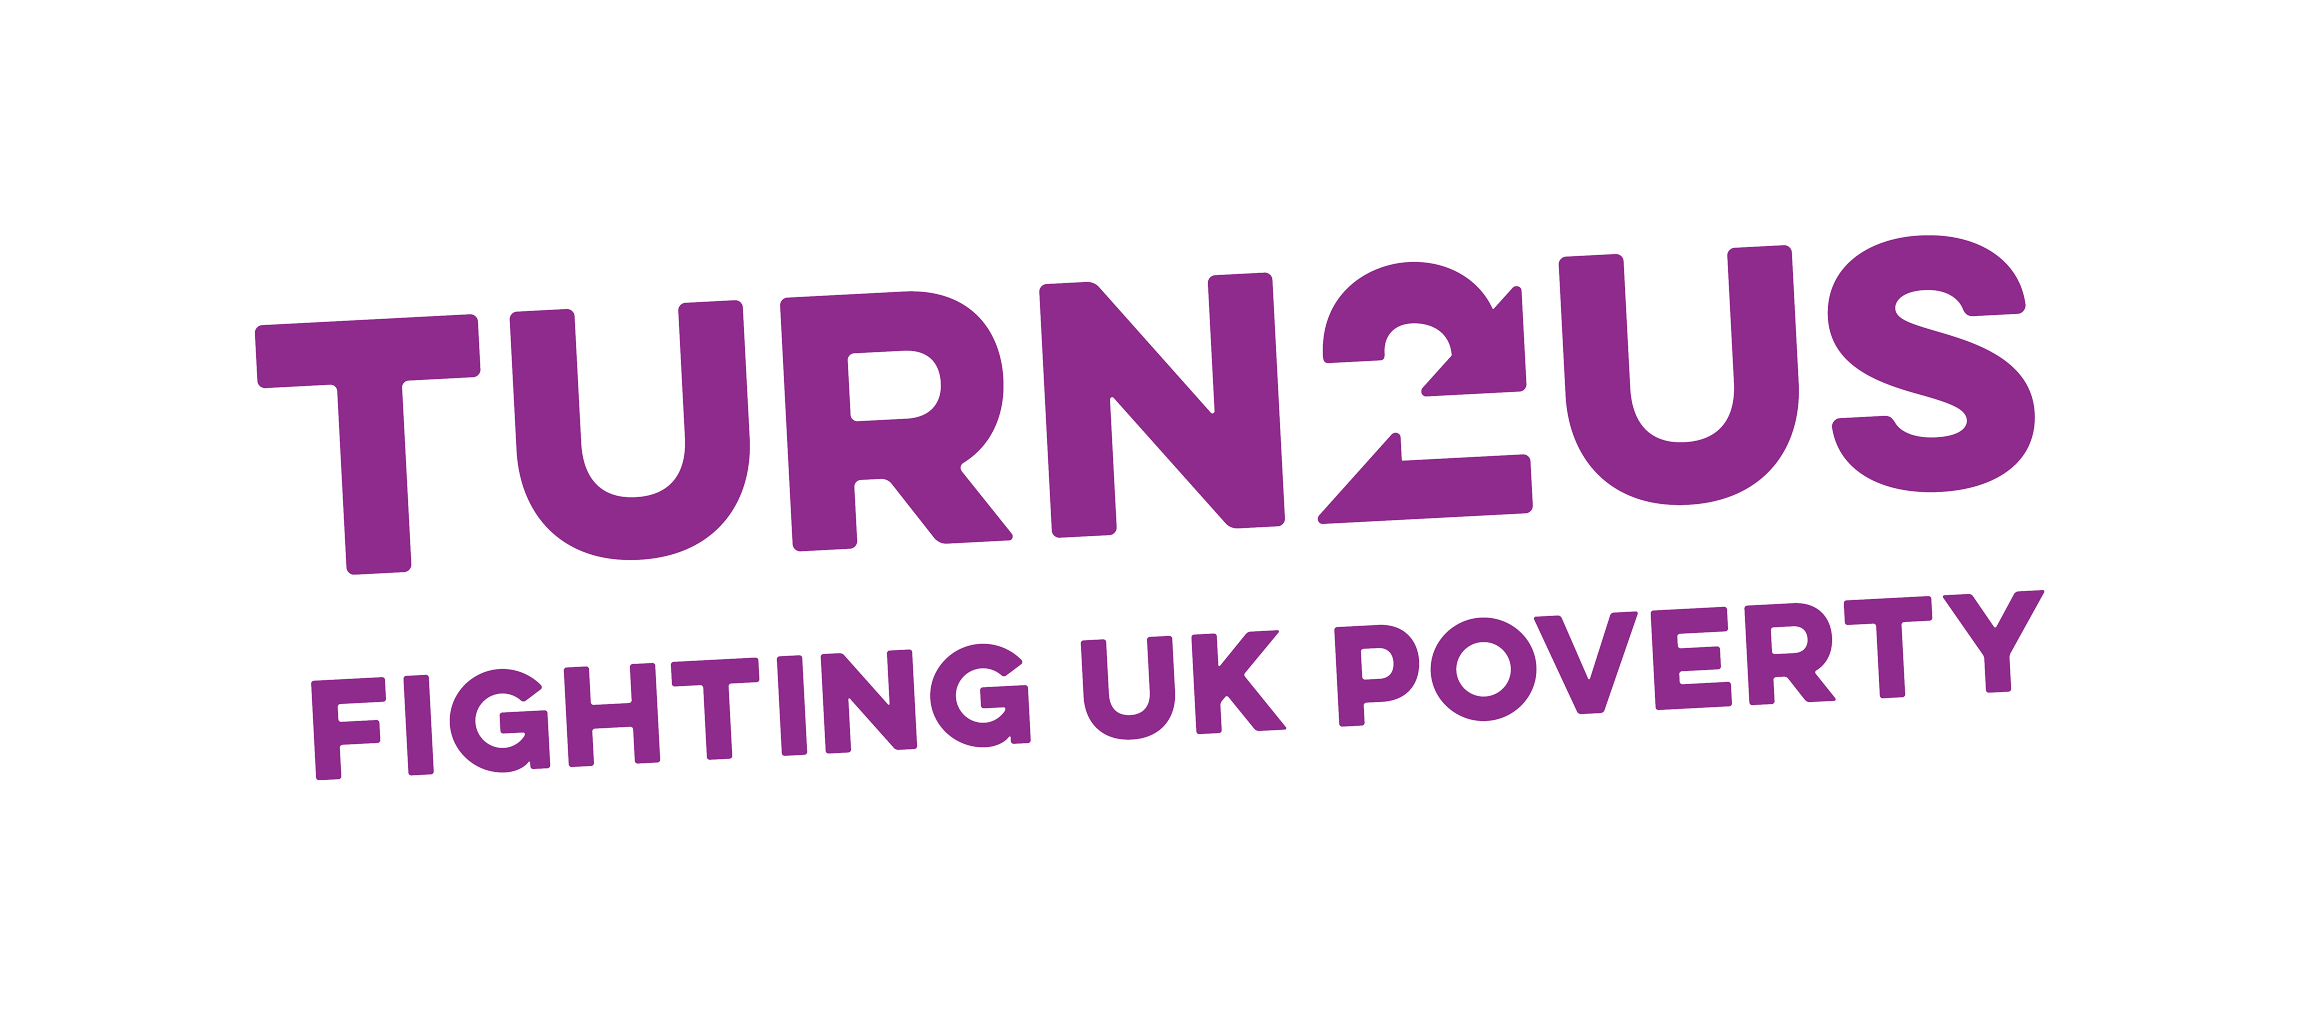 Turn2Us - Fighting UK Poverty